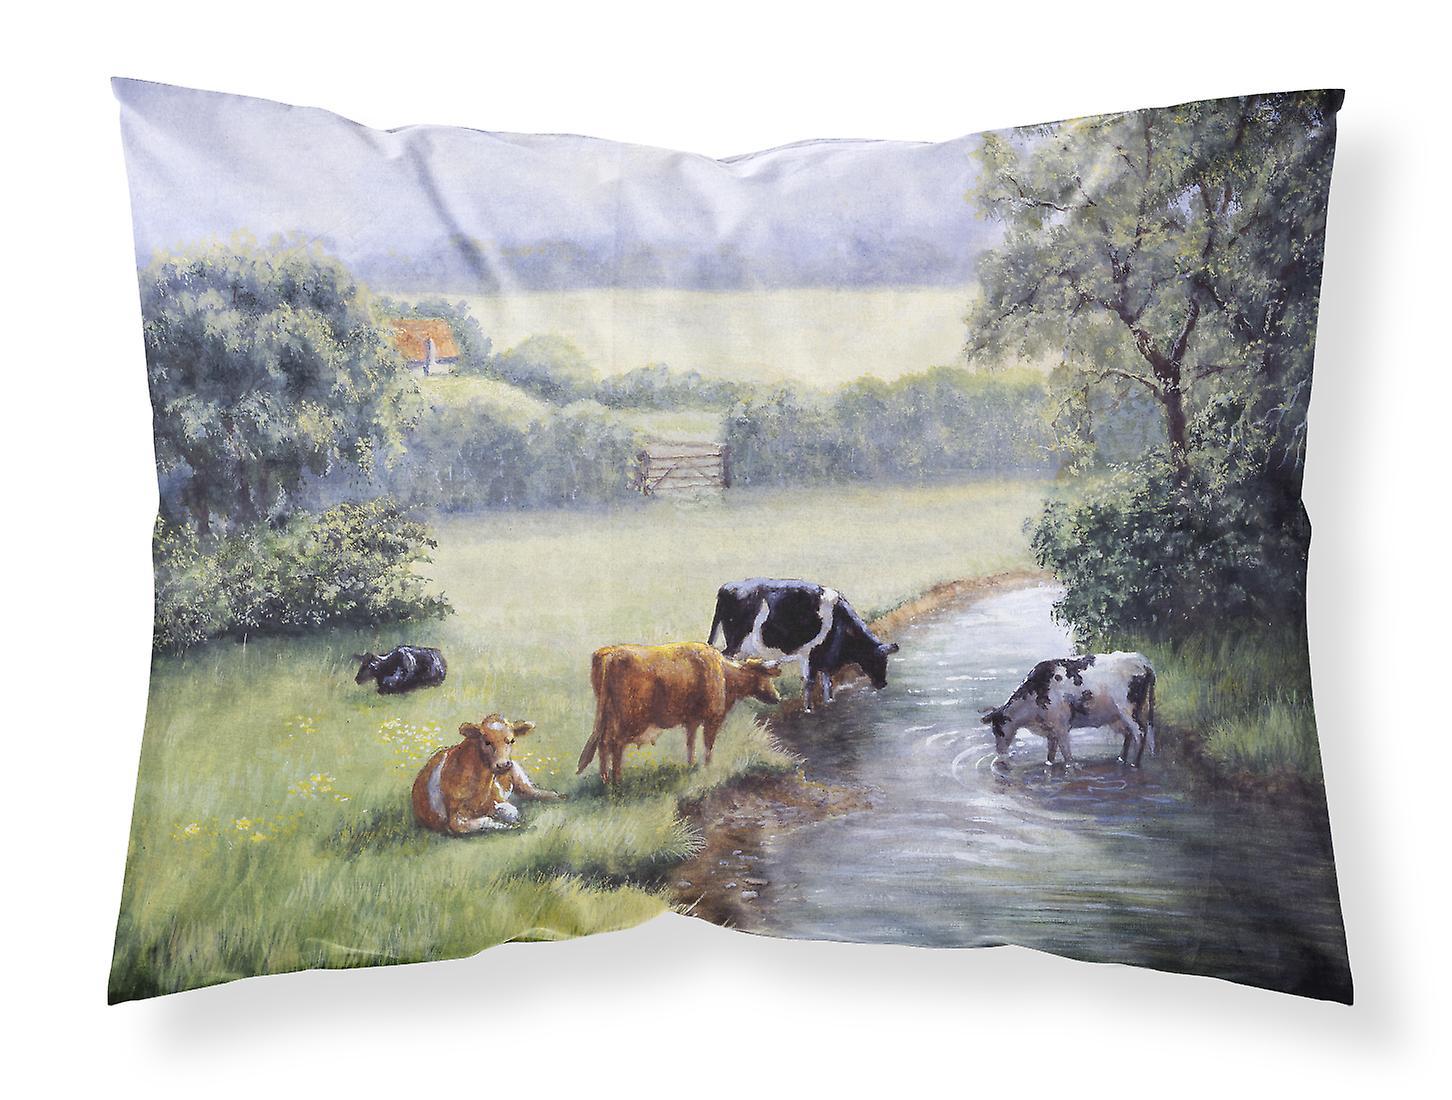 D'oreiller Tissu Ruisseau Standard Vaches À Boire La Taie Du Berges u3K1lFJTc5